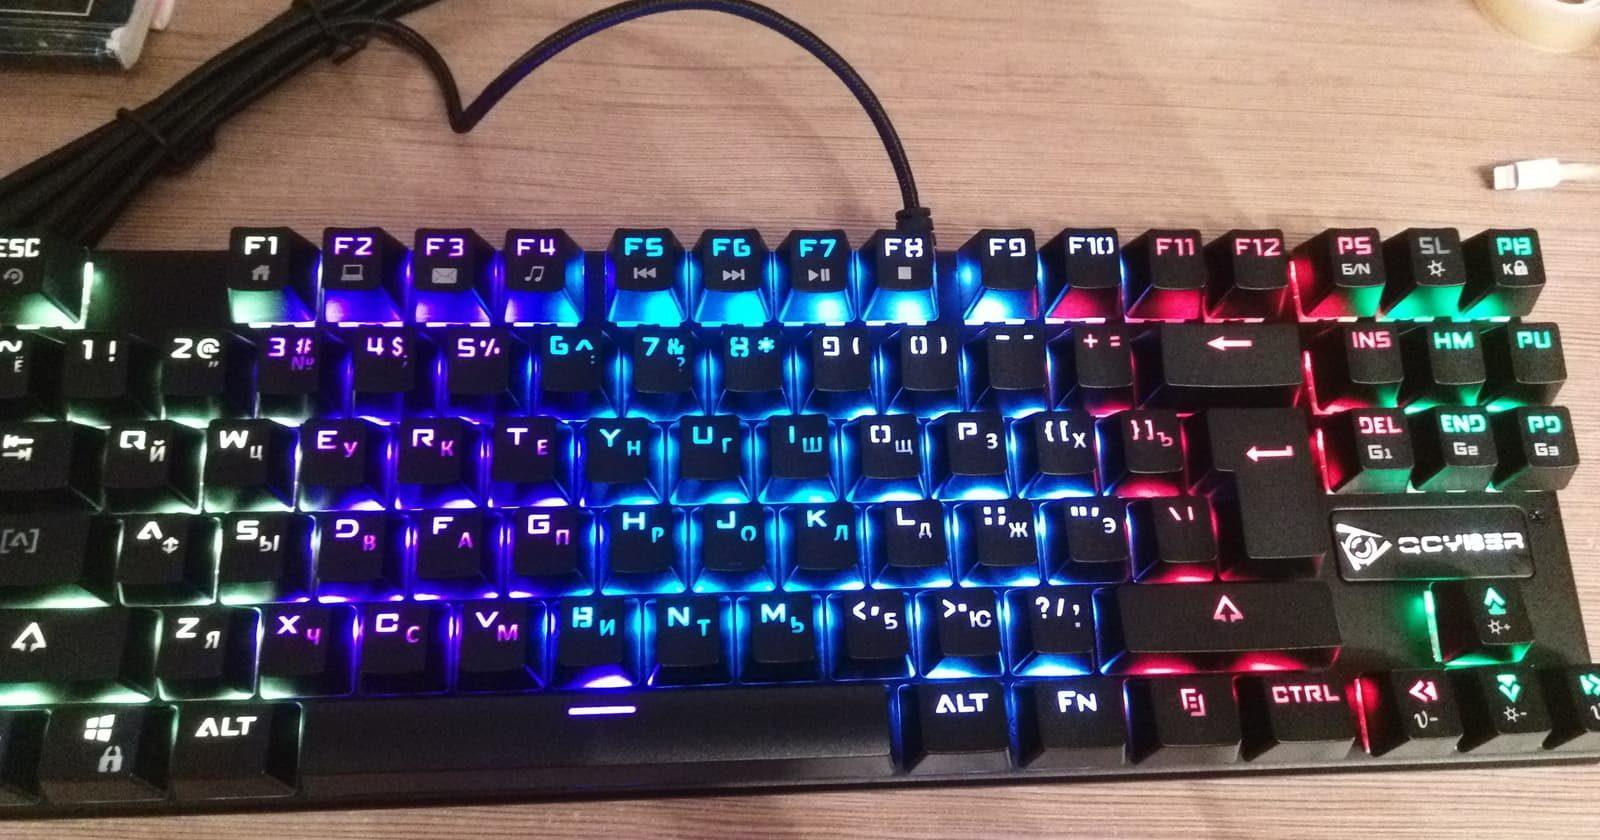 Qcyber Dominator TKL Black USB